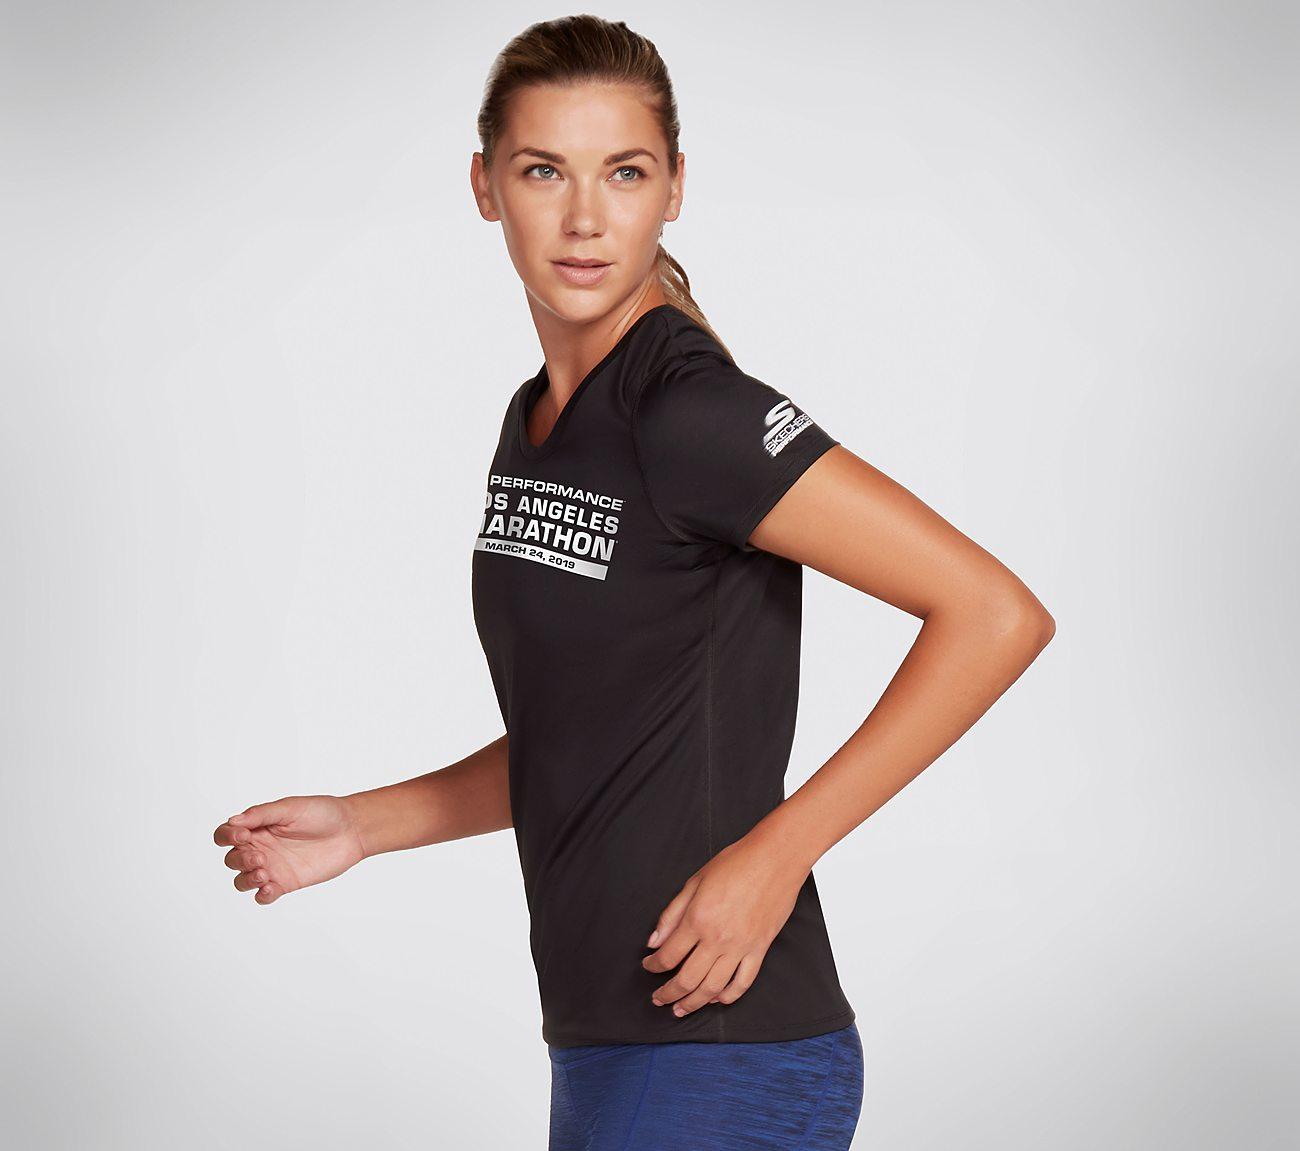 Skechers Performance Los Angeles Marathon 2019 Tech Tee Shirt